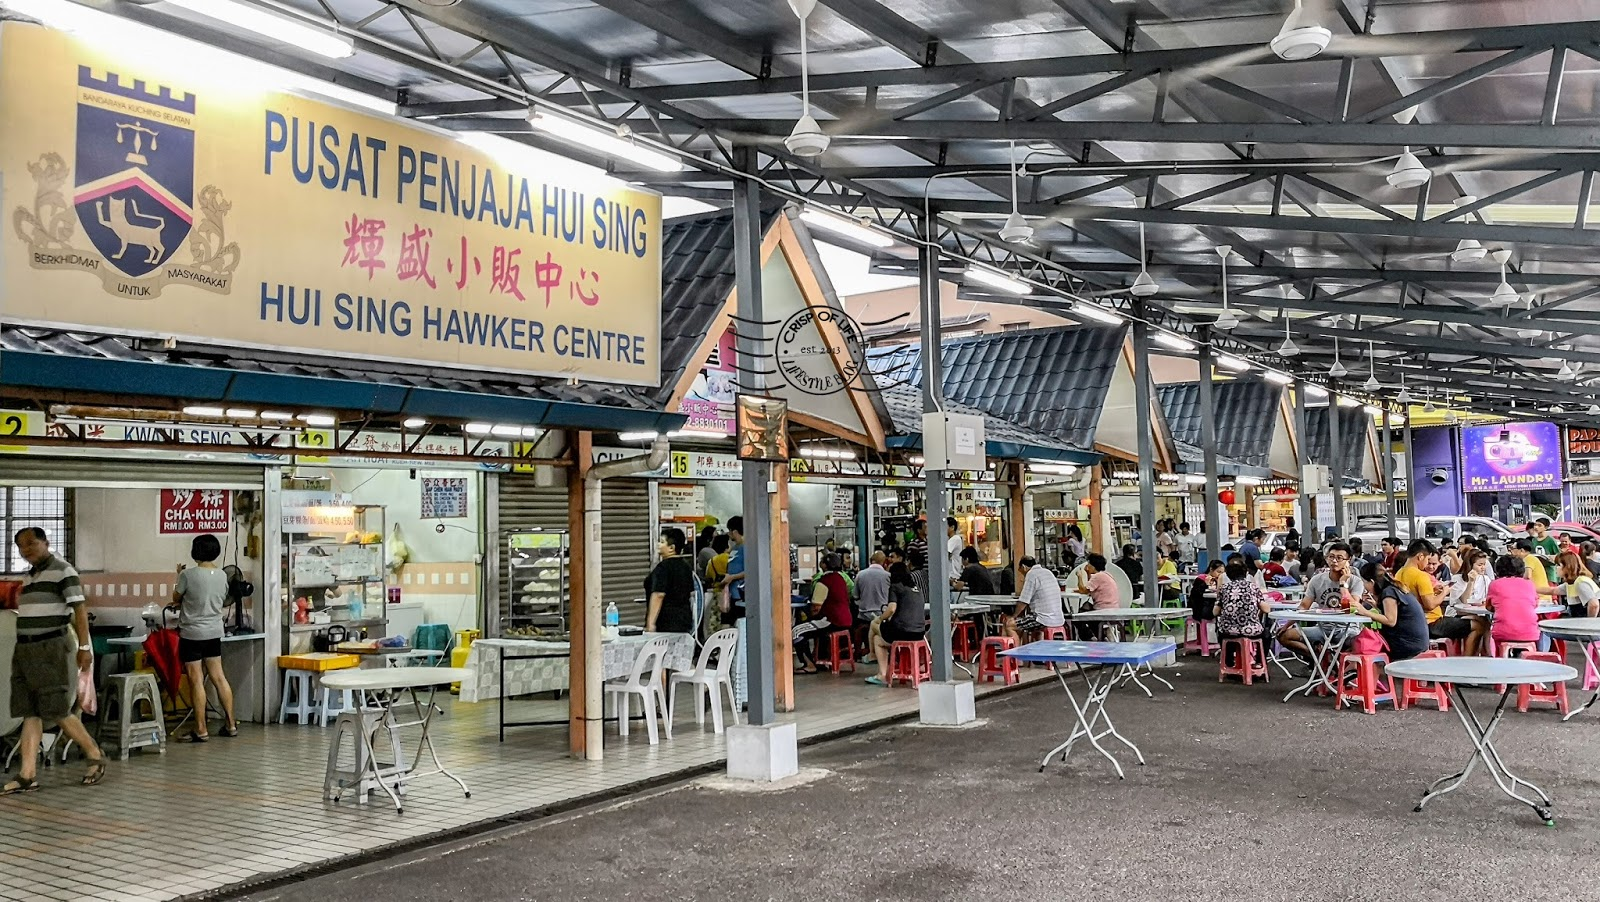 Hui Sing Hawker Centre 辉盛小贩中心 @ Kuching, Sarawak